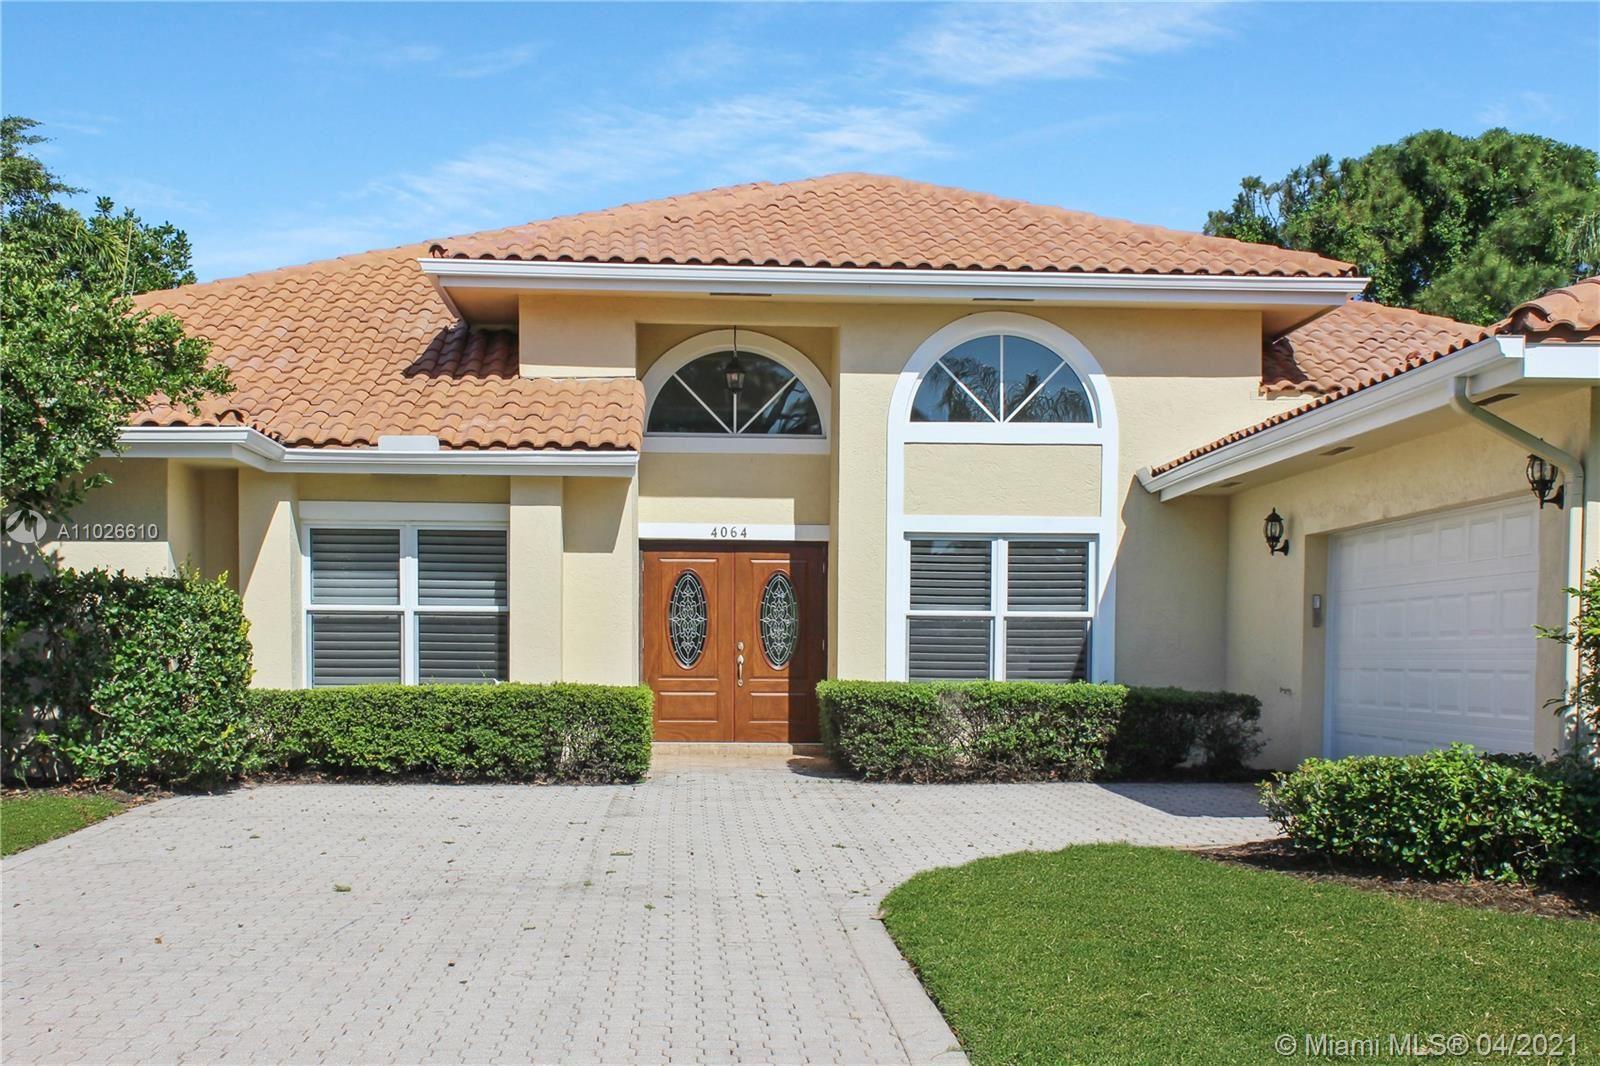 4064 SW Gleneagle Cir, Palm City, FL 34990 - #: A11026610